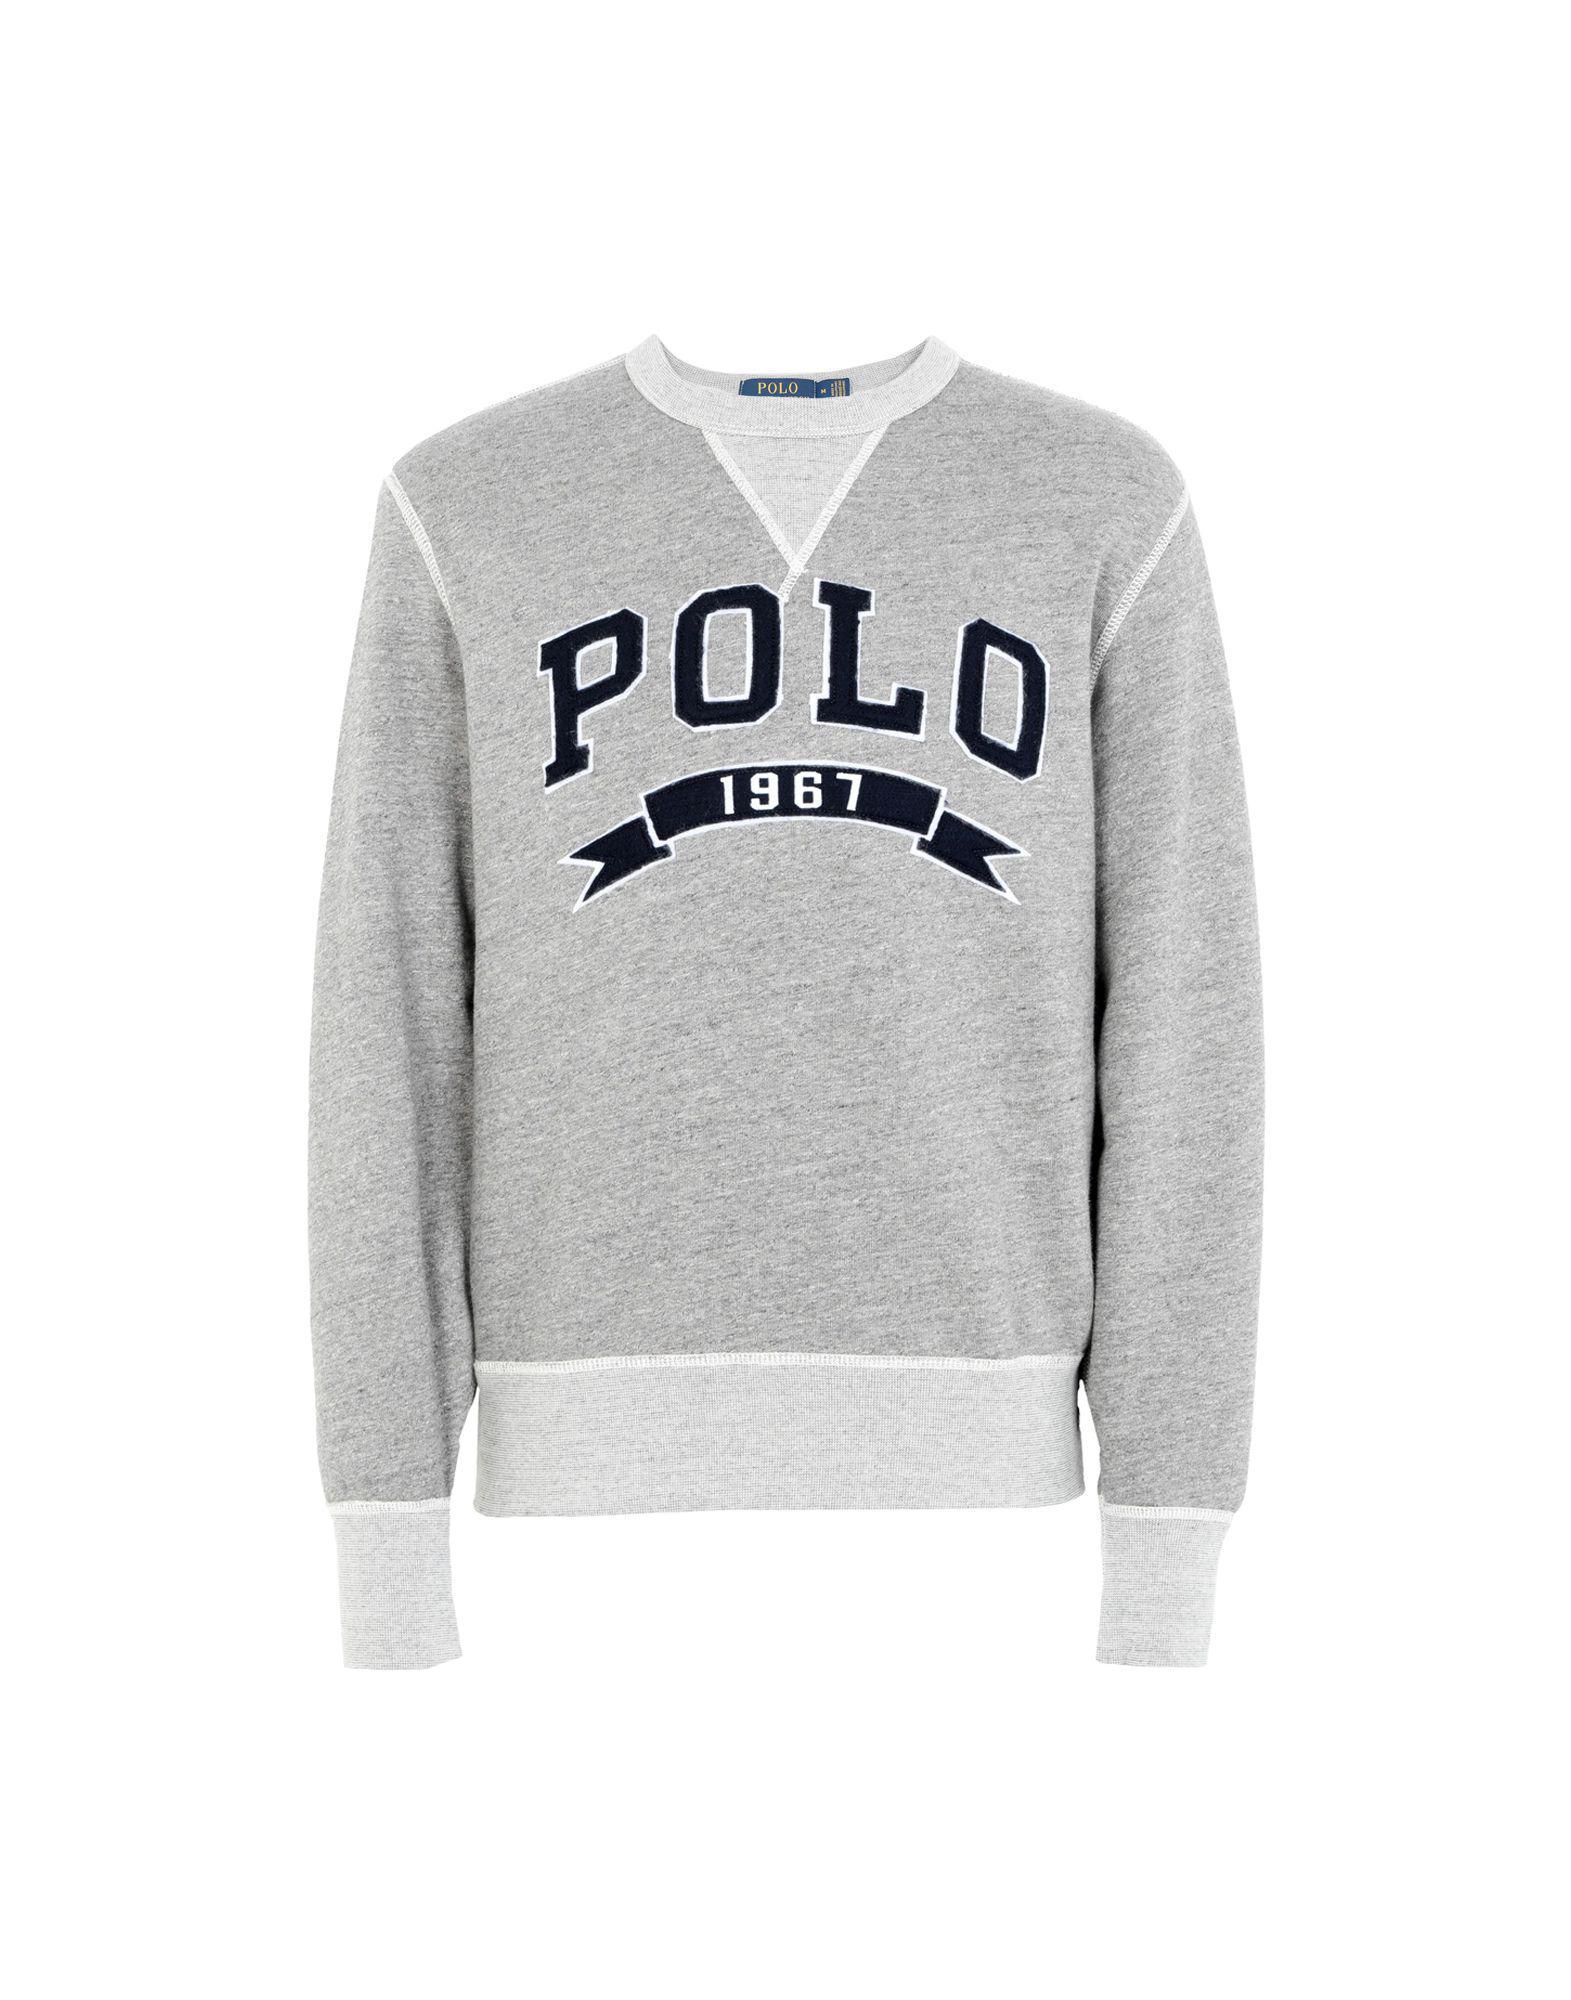 c9e51f89a5e4 Polo Ralph Lauren Cotton-blend-fleece Sweatshirt in Gray for Men ...